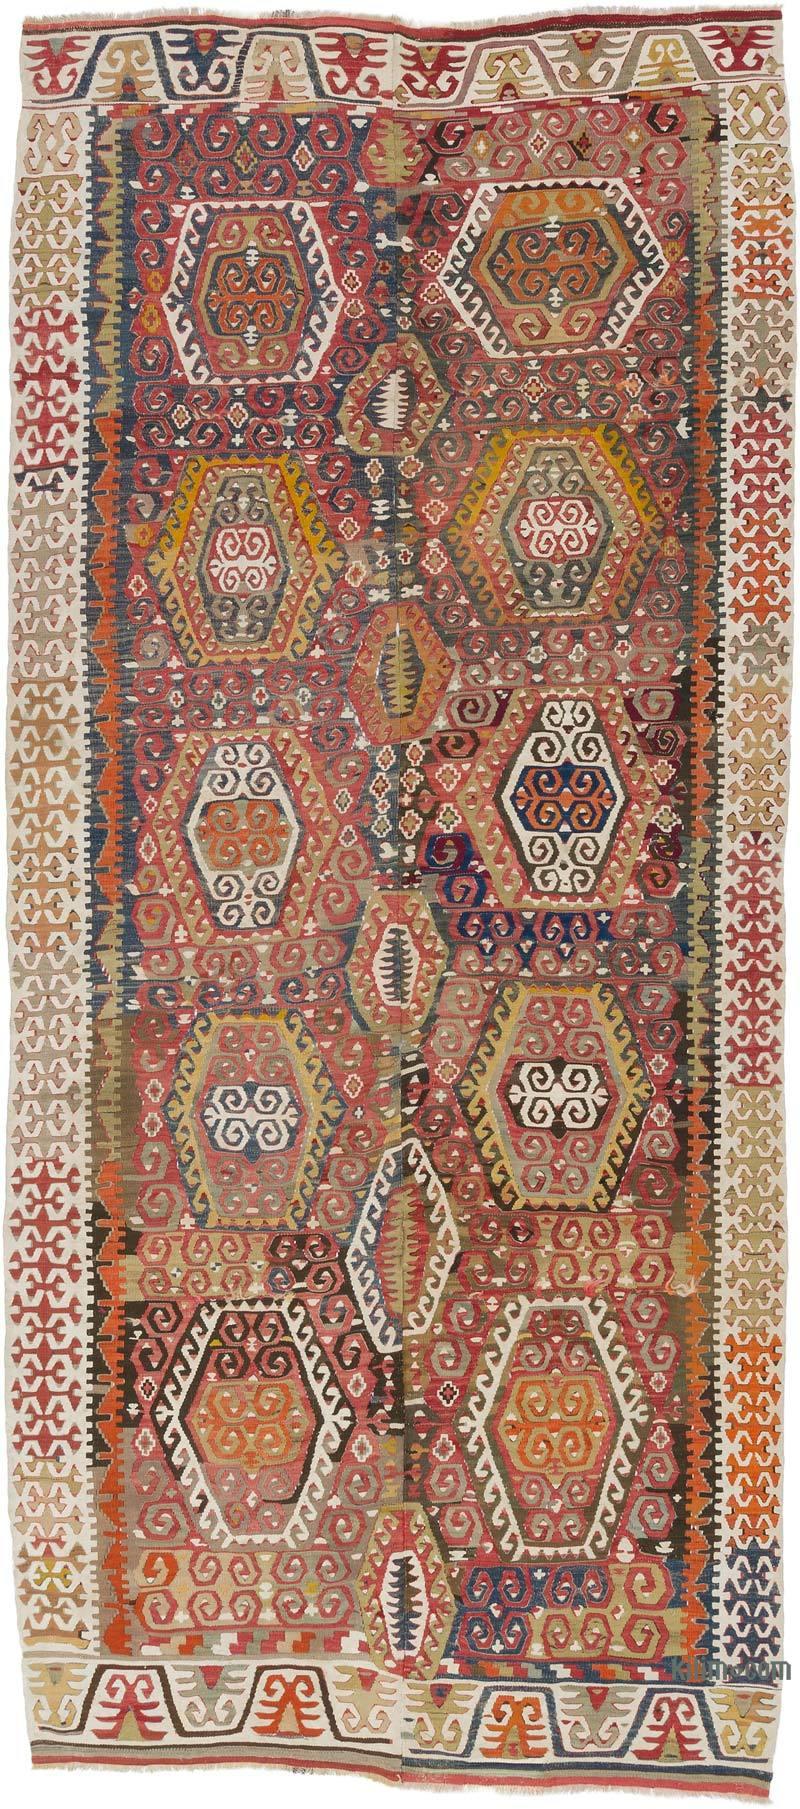 K0020925 Multicolor Vintage Konya Kilim Rug 5 X 11 6